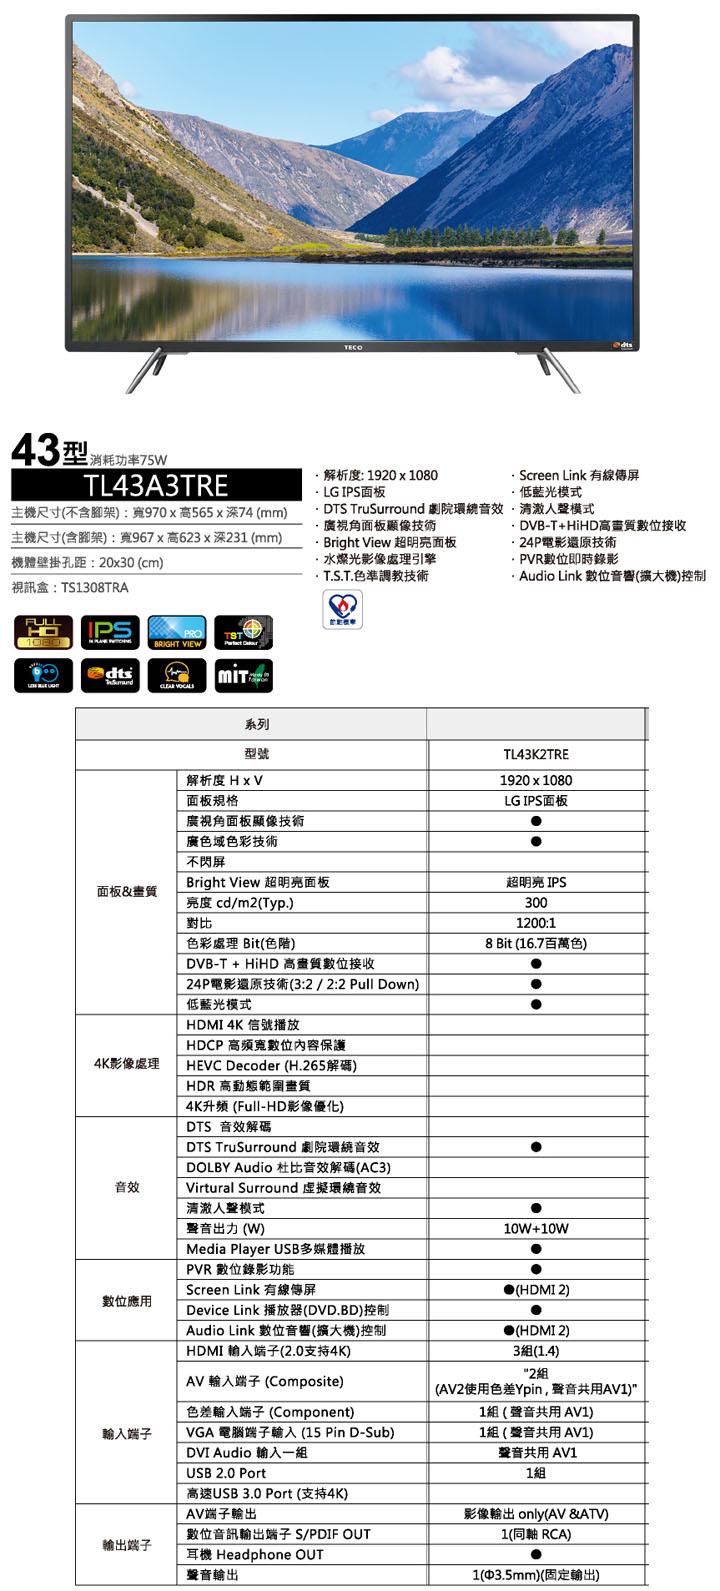 TECO_TL43A3TRE_spec.jpg